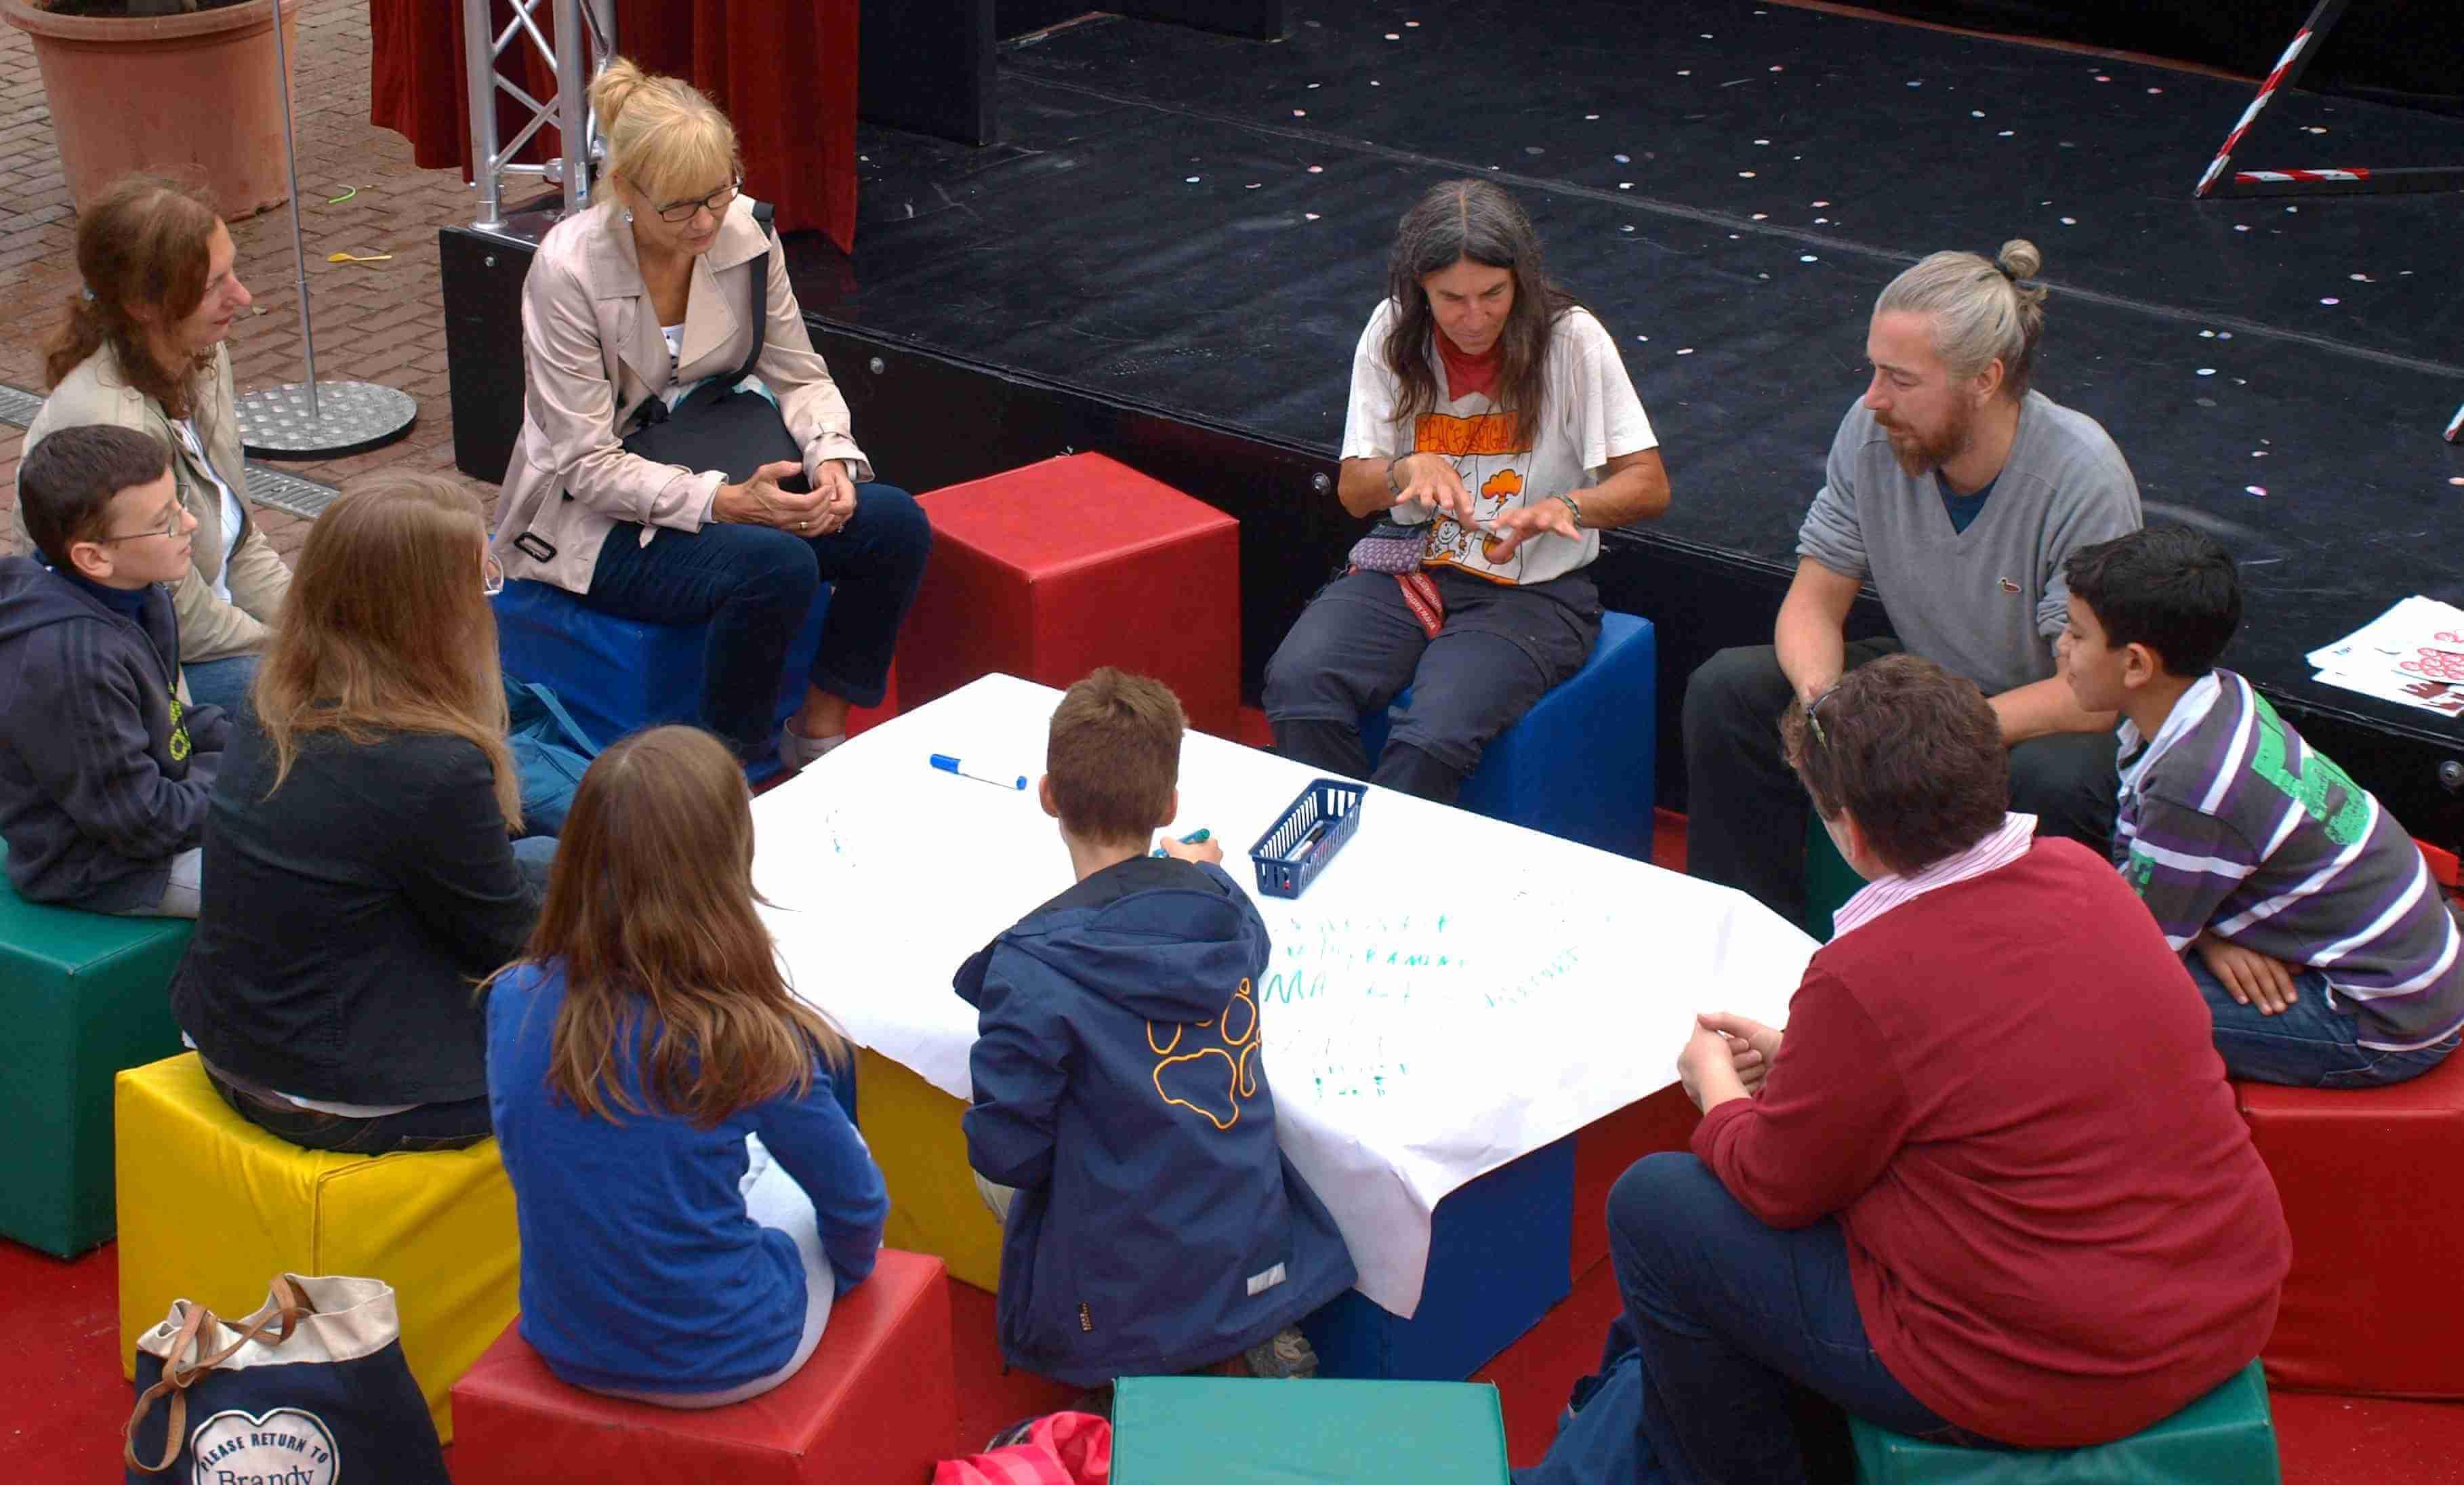 Viva la Mexico!: Steglitz-Zehlendorf will Jugendarbeit stärker internationalisieren